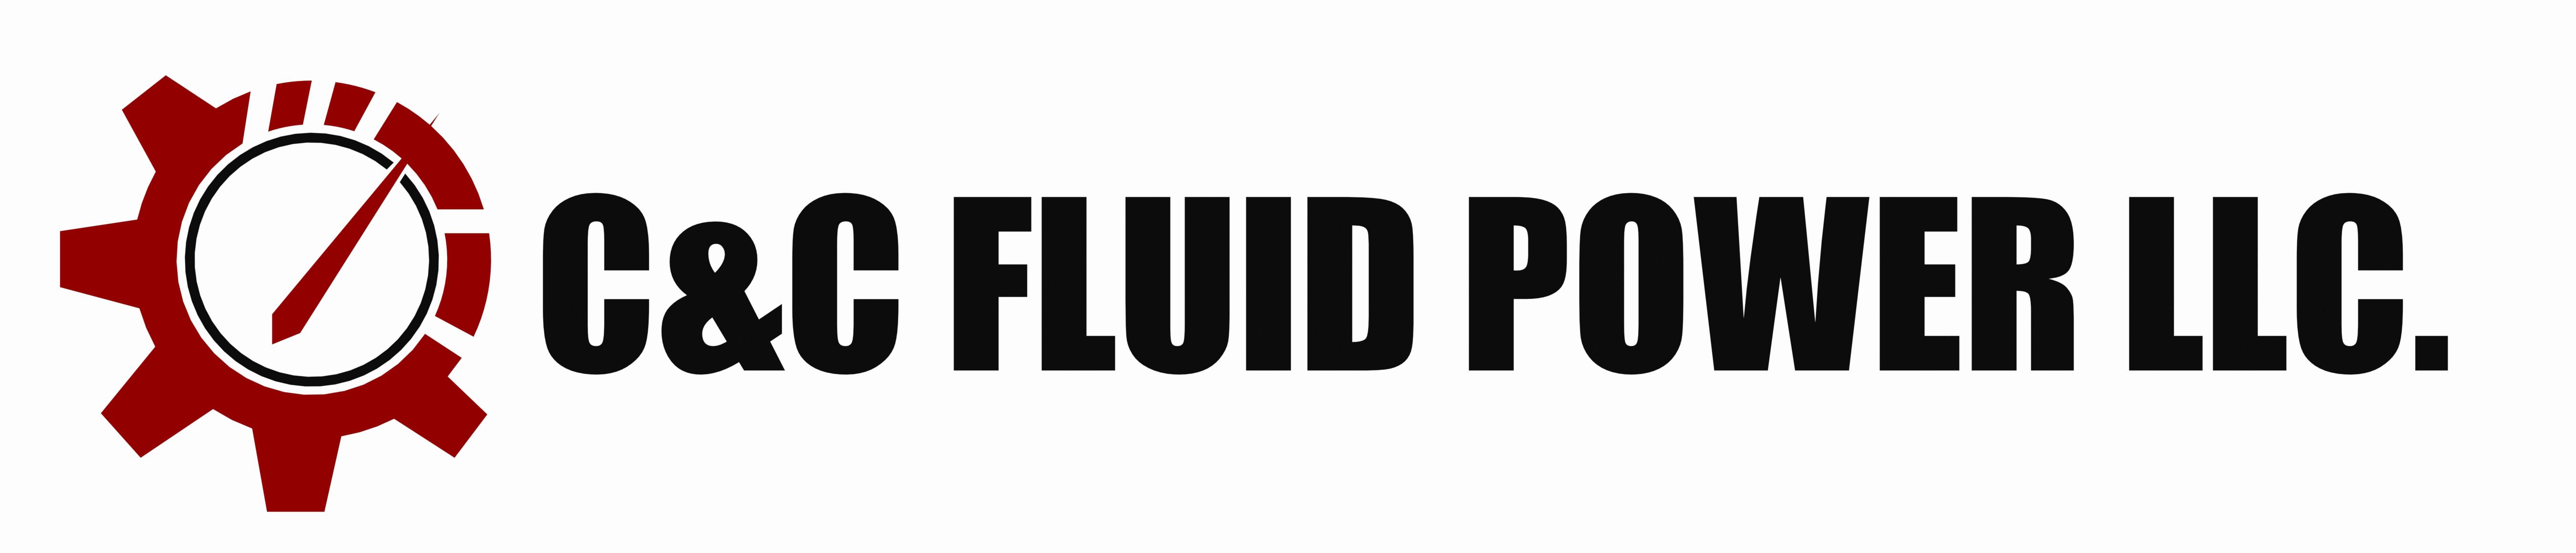 C&C Fluid Power